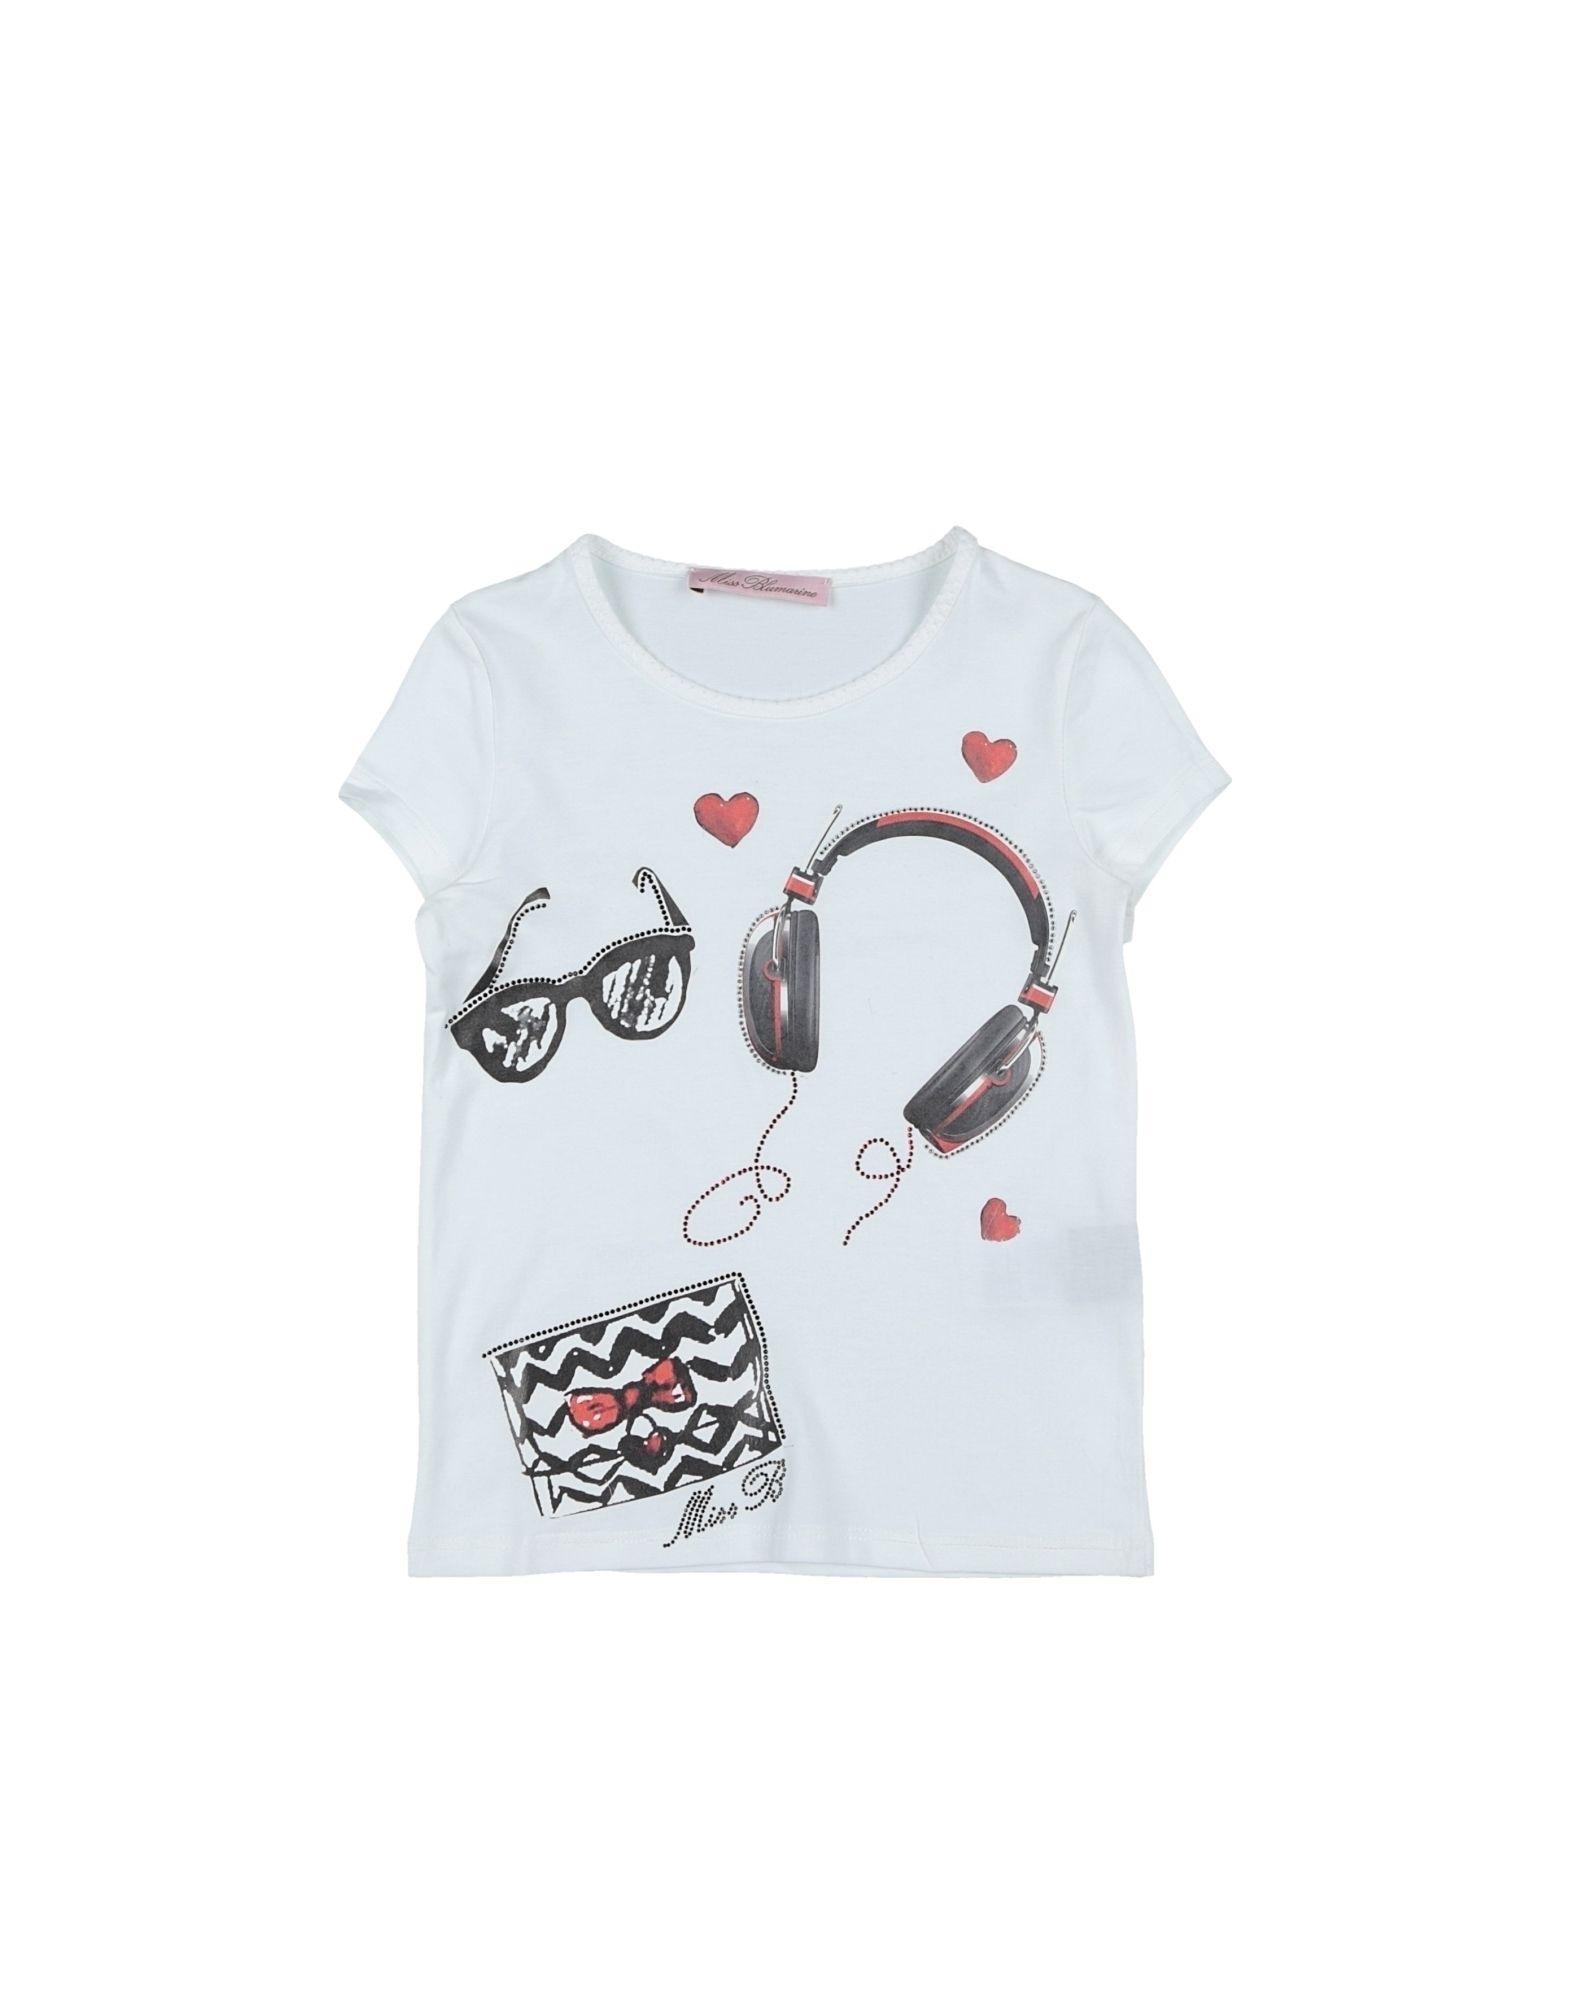 Miss Blumarine Kids' T-shirts In White